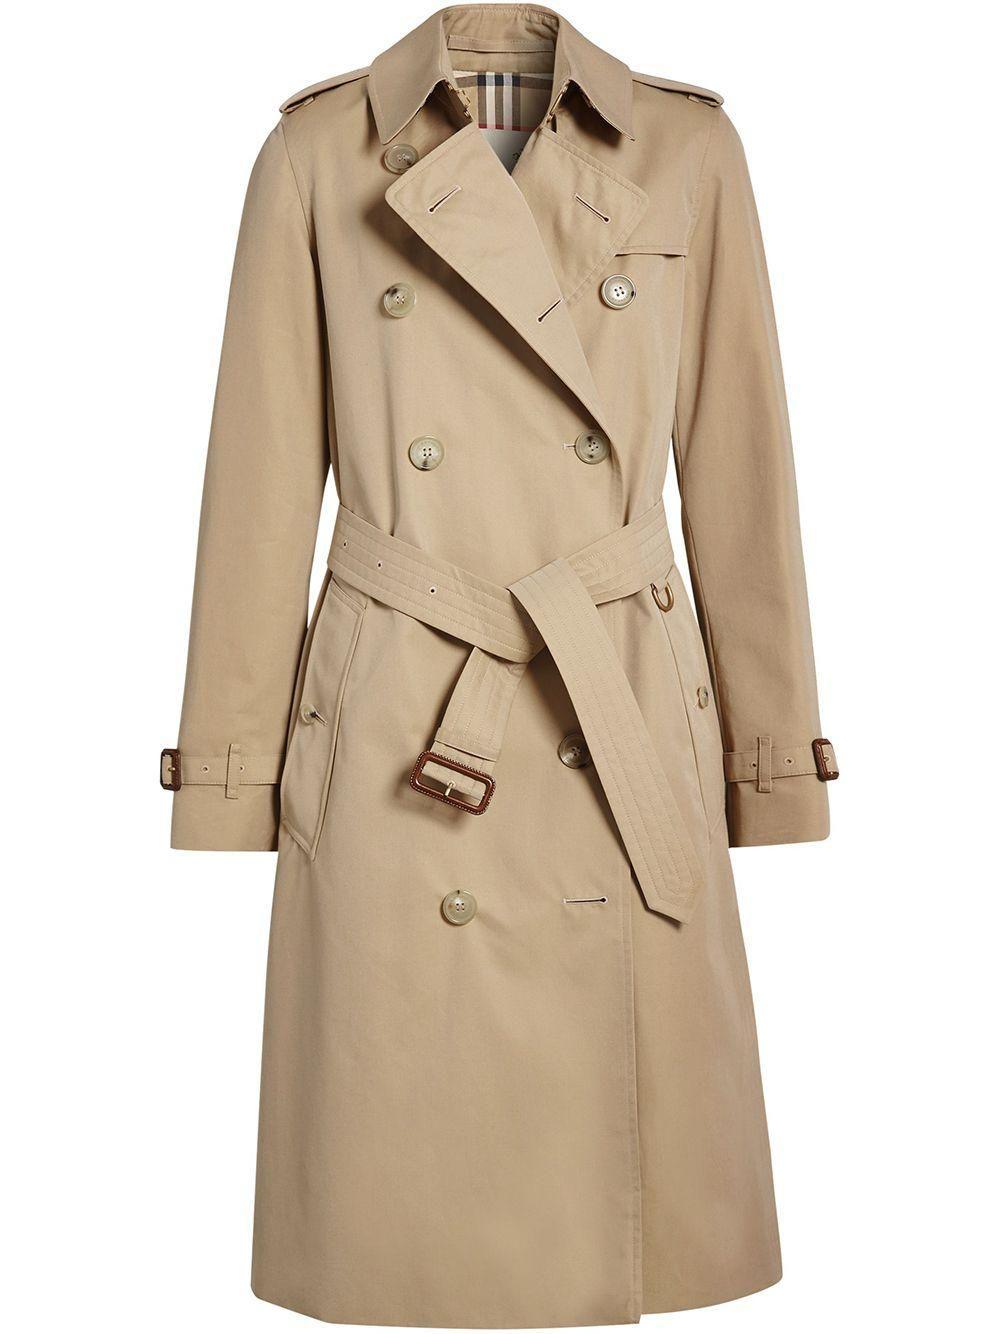 Kensington Heritage Long Trench Coat